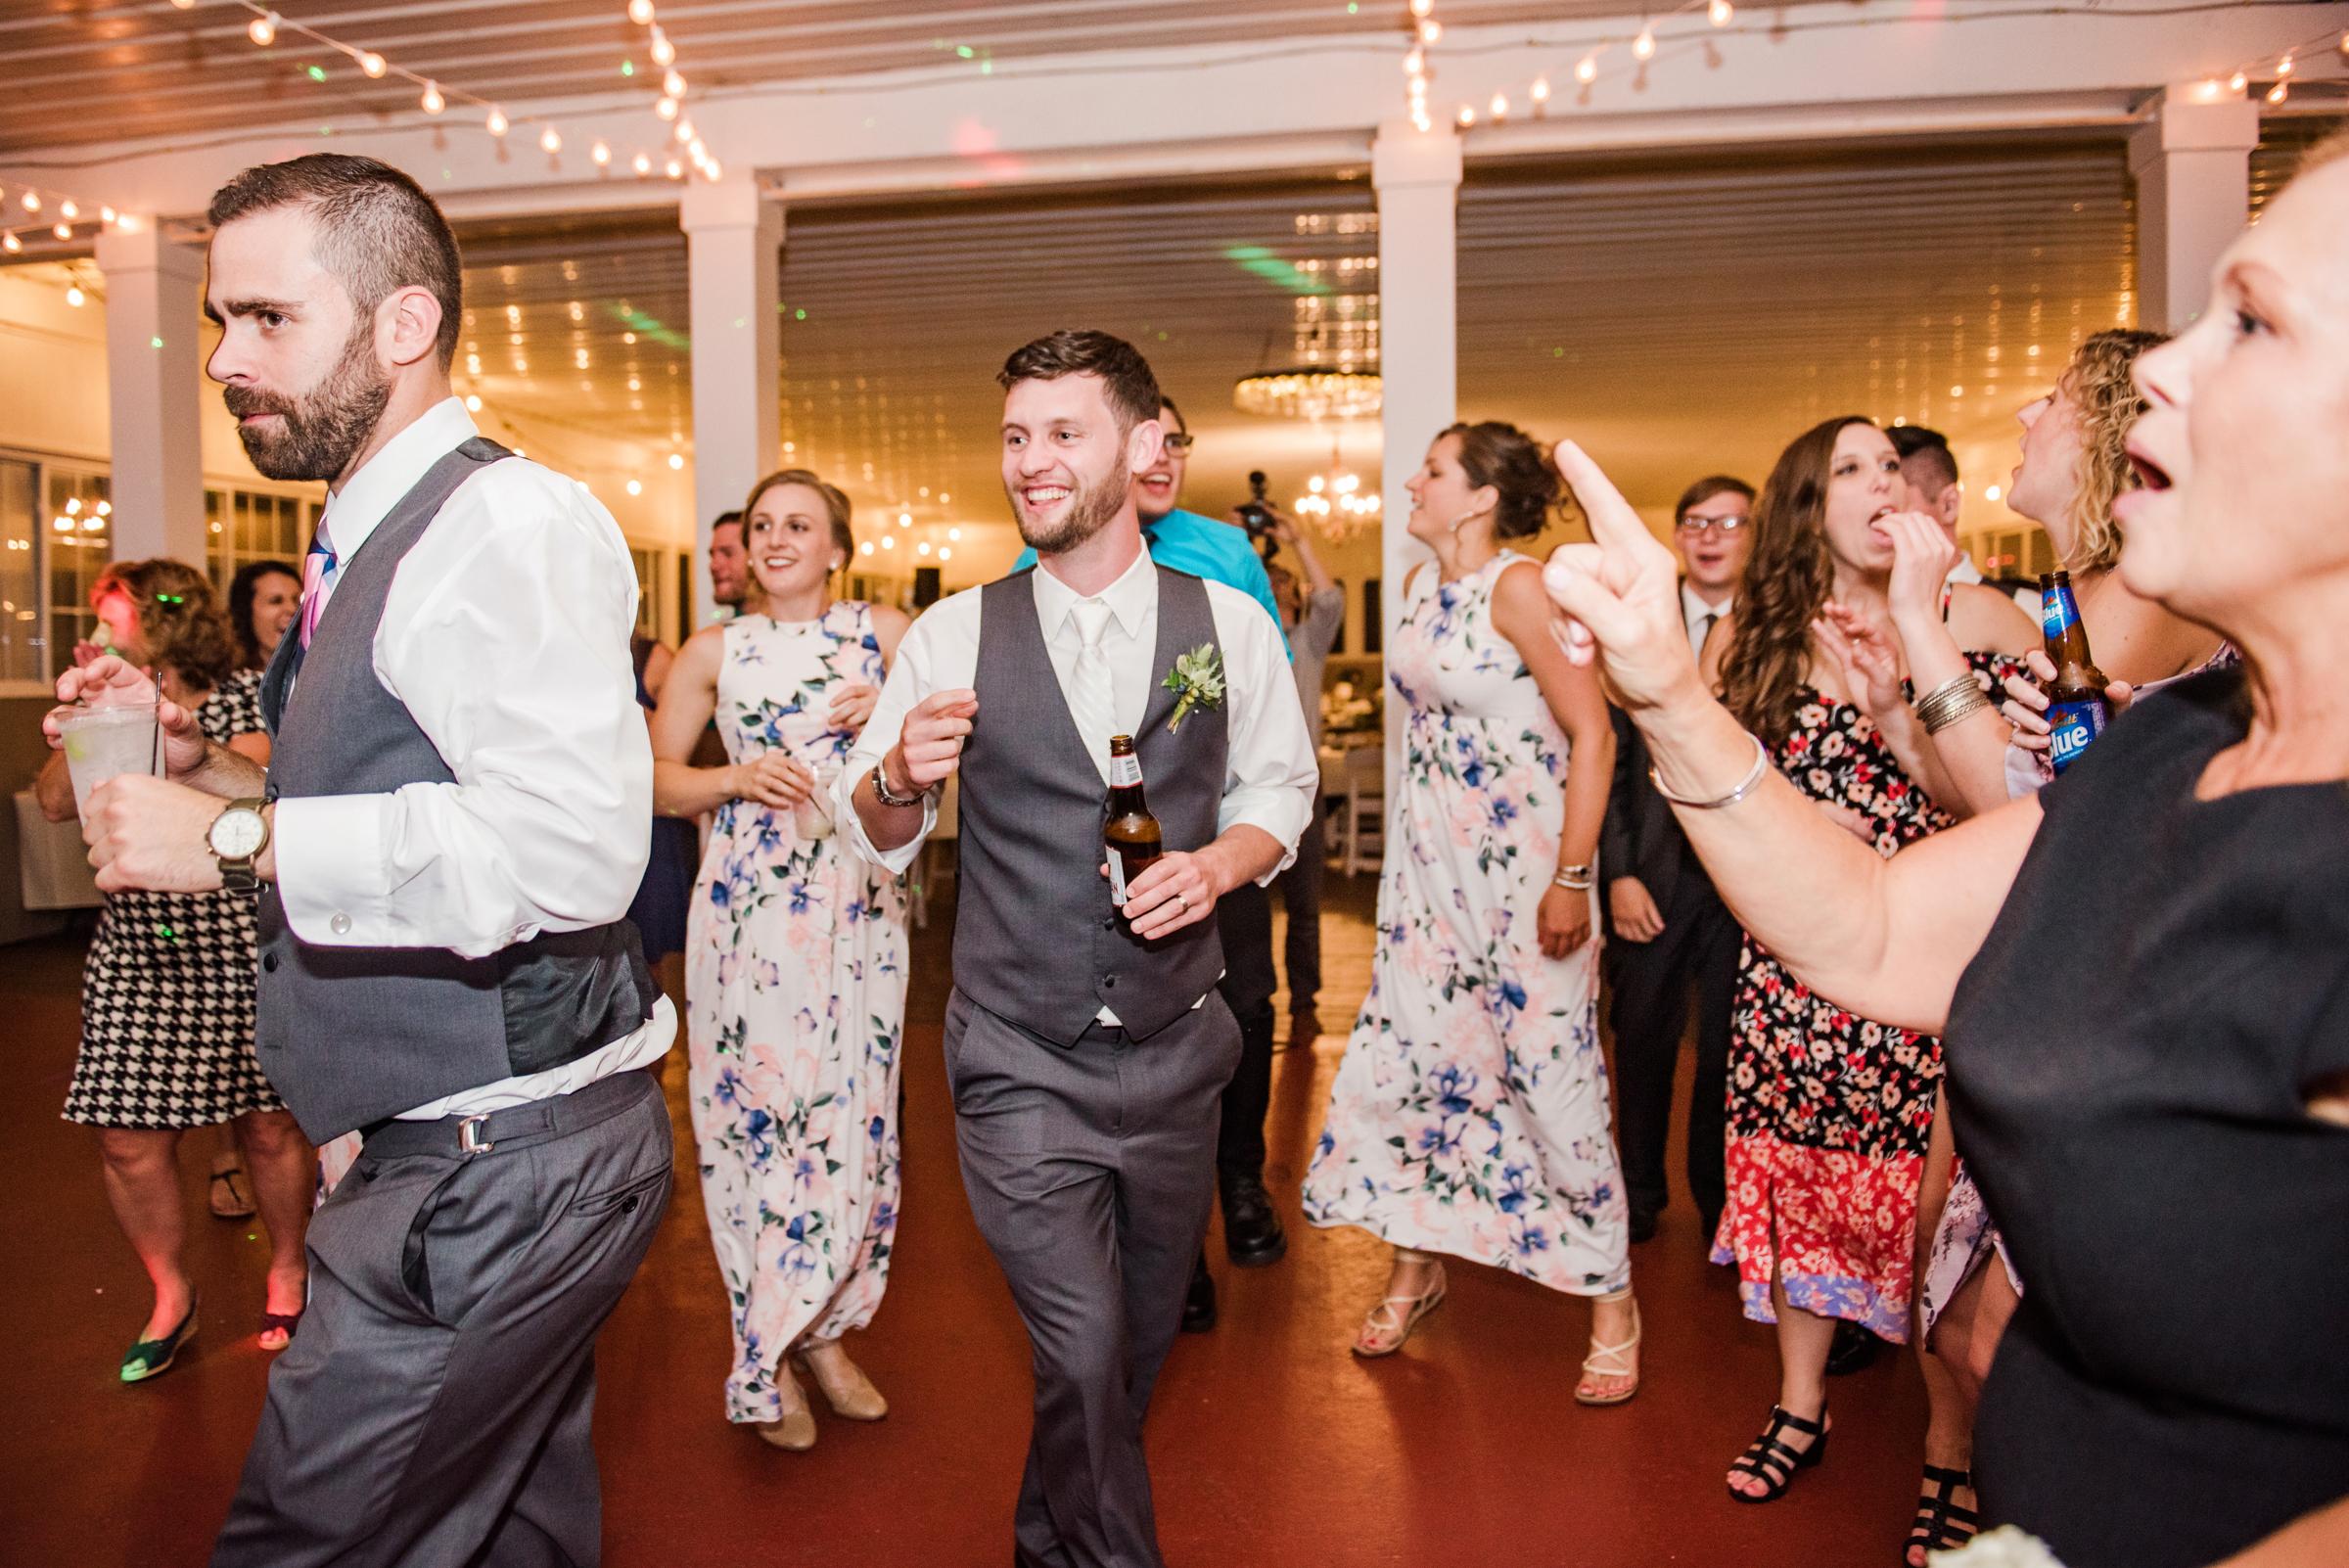 Jerris_Wadsworth_Wedding_Barn_Rochester_Wedding_JILL_STUDIO_Rochester_NY_Photographer_DSC_3210.jpg